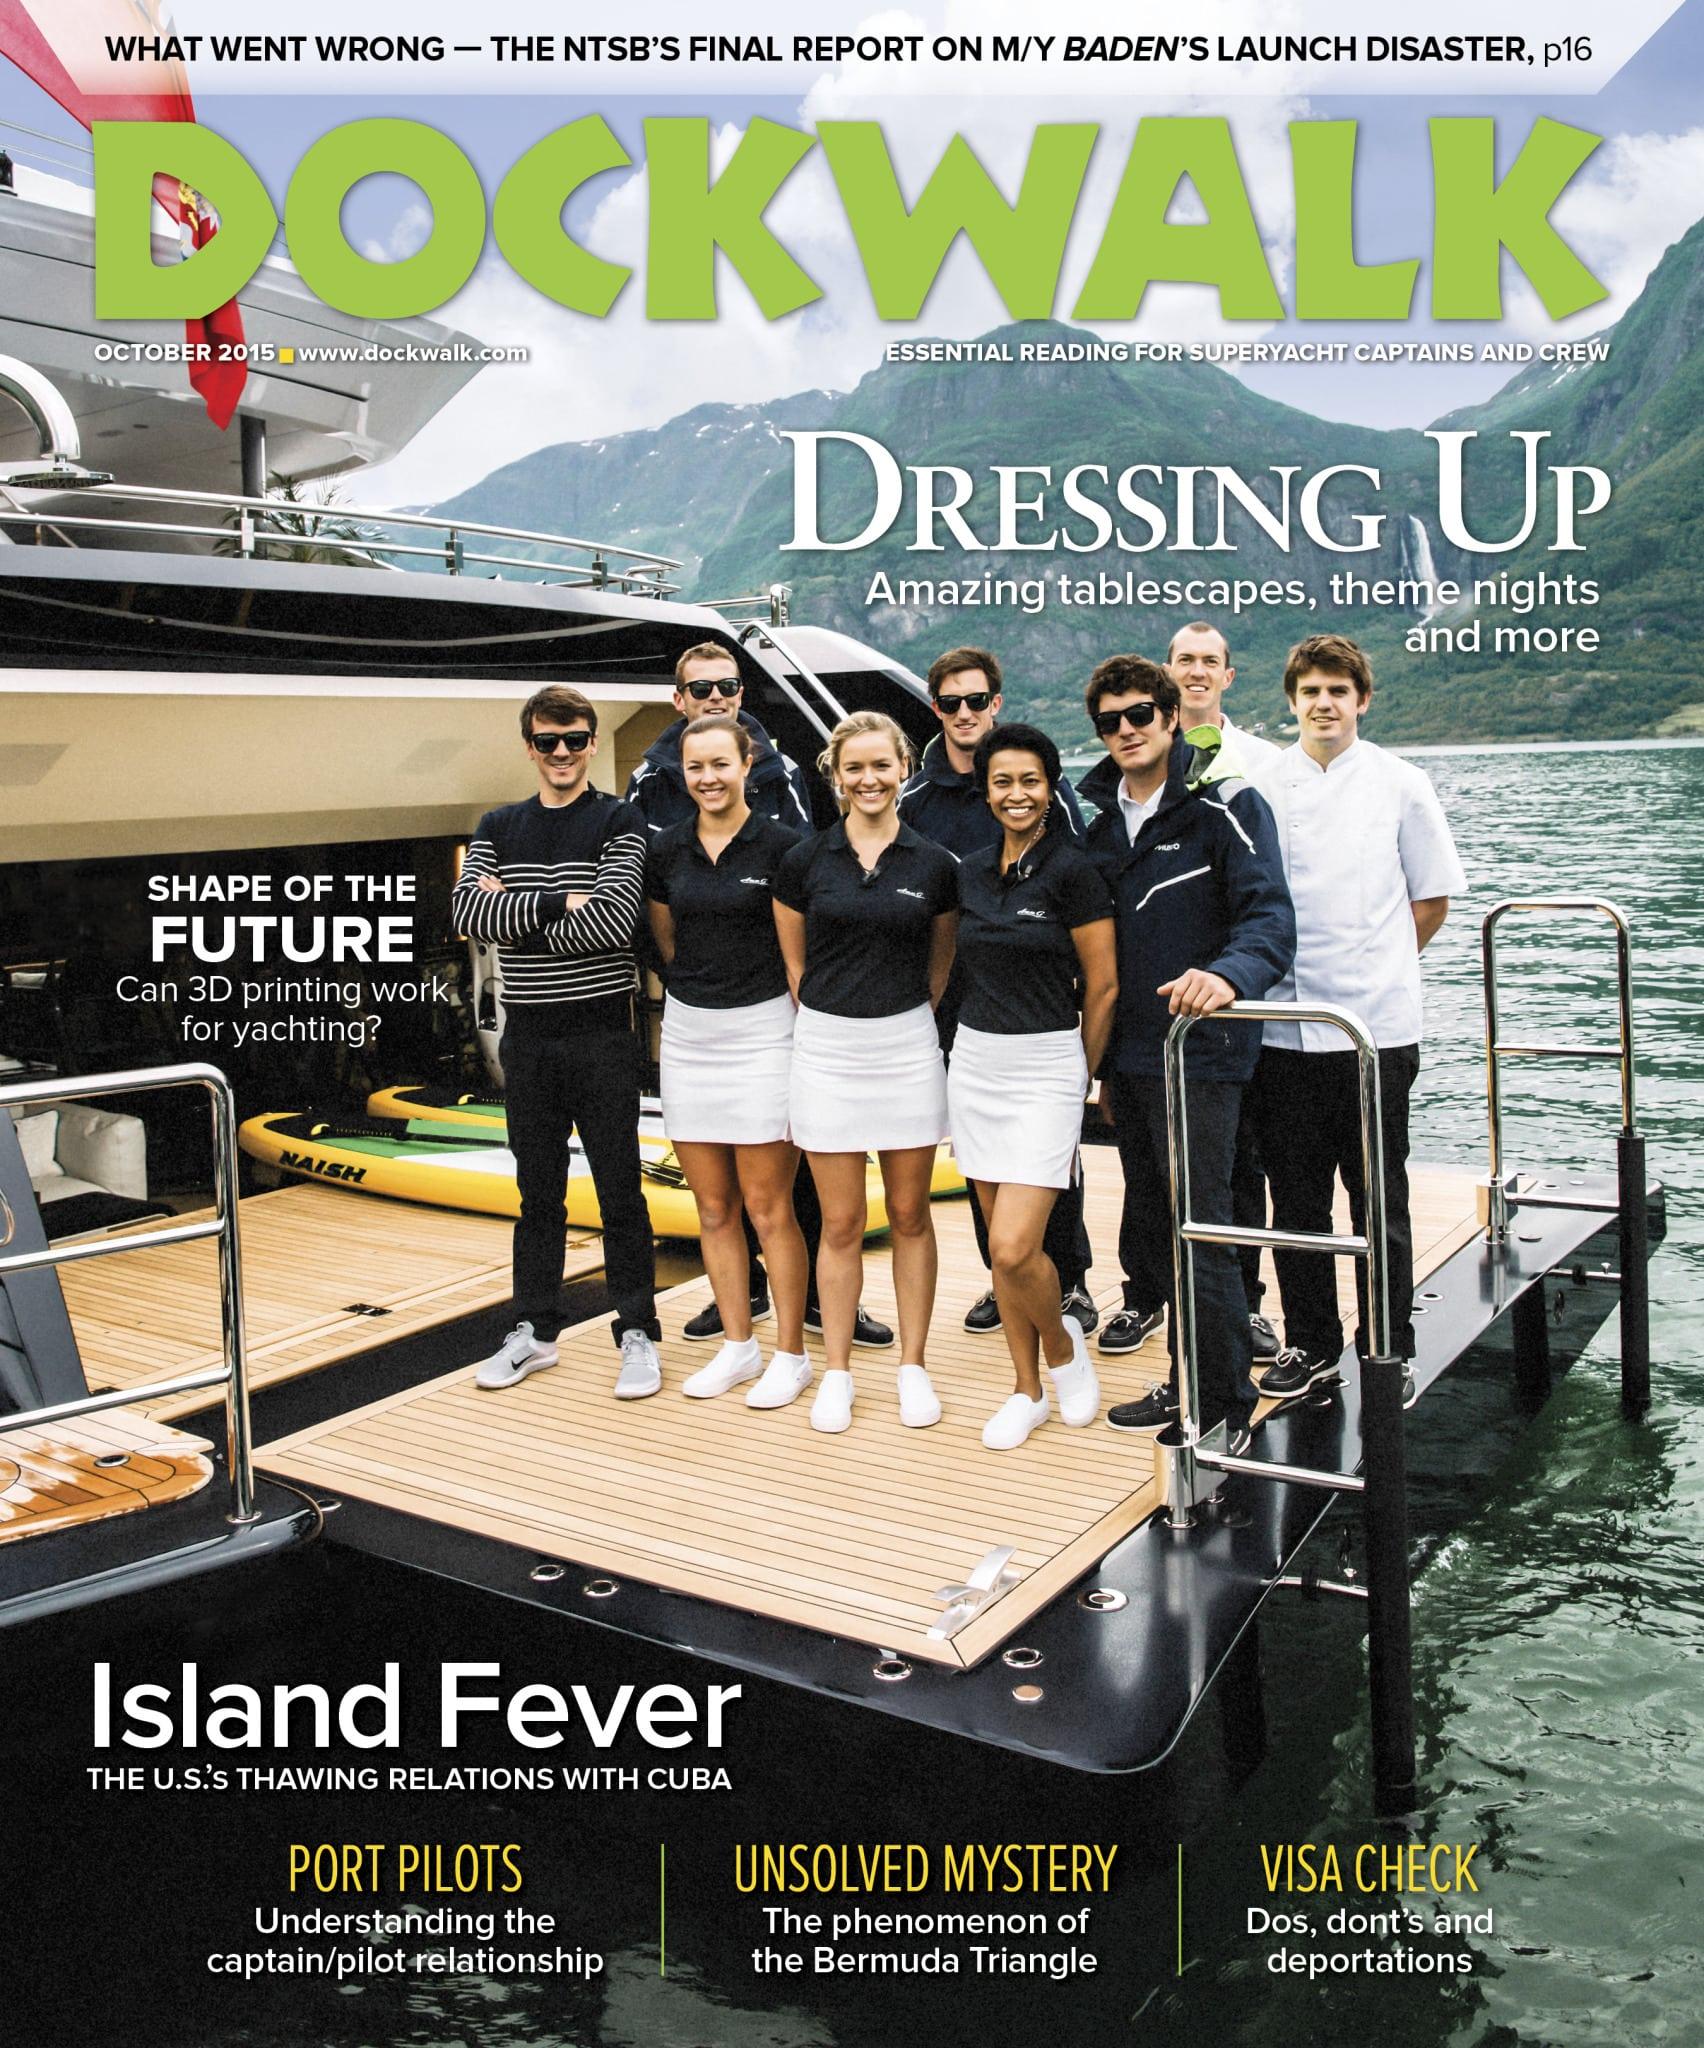 DOCKWALK_B2B_Full_Issue_Eddies